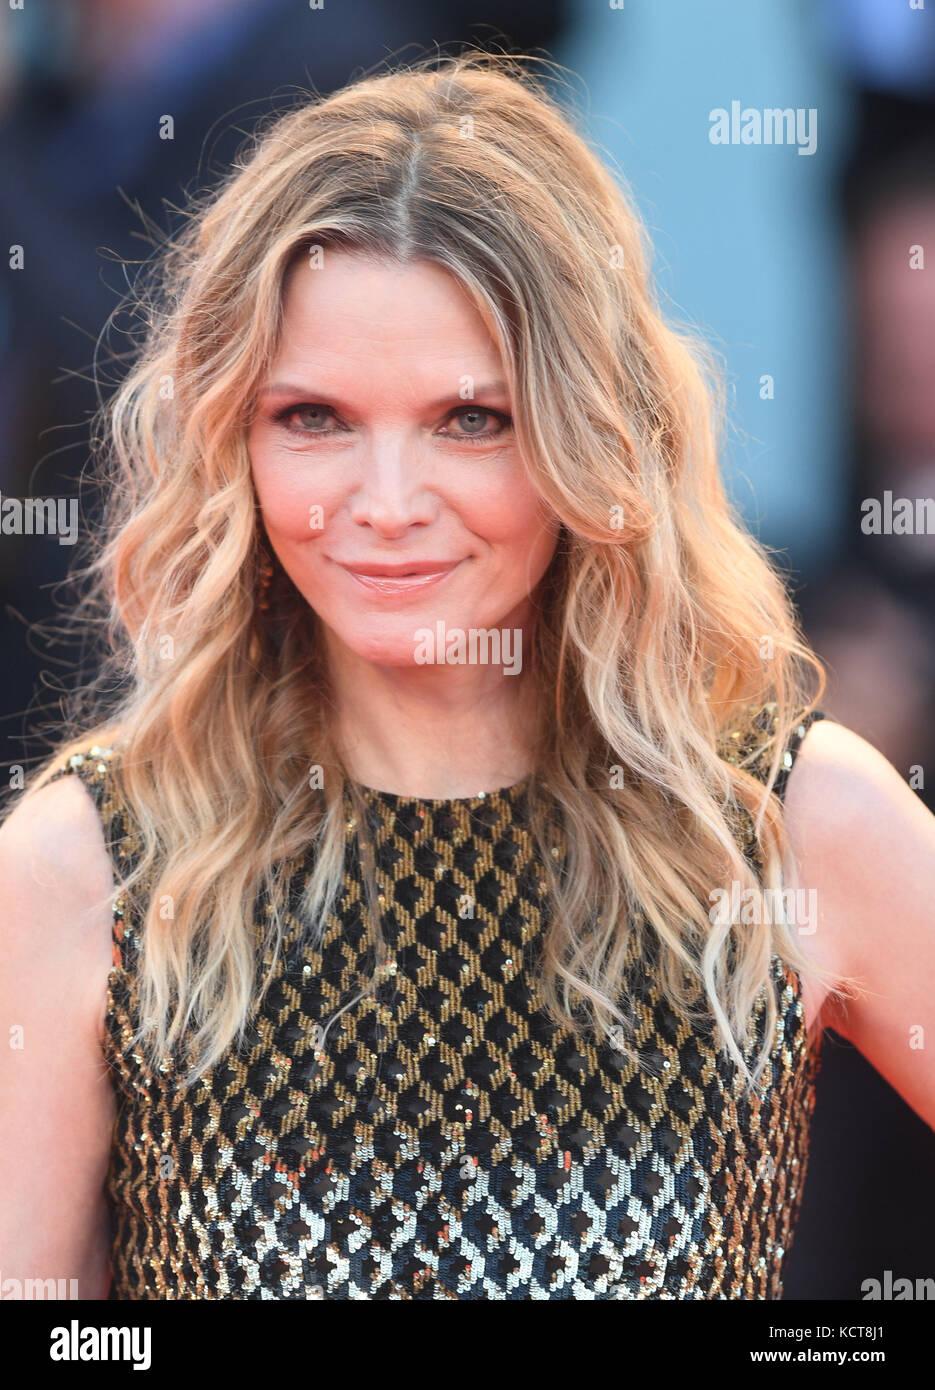 74th Venice Film Festival - Mother! - Premiere  Featuring: Michelle Pfeiffer Where: Venice, Italy When: 05 Sep 2017 - Stock Image